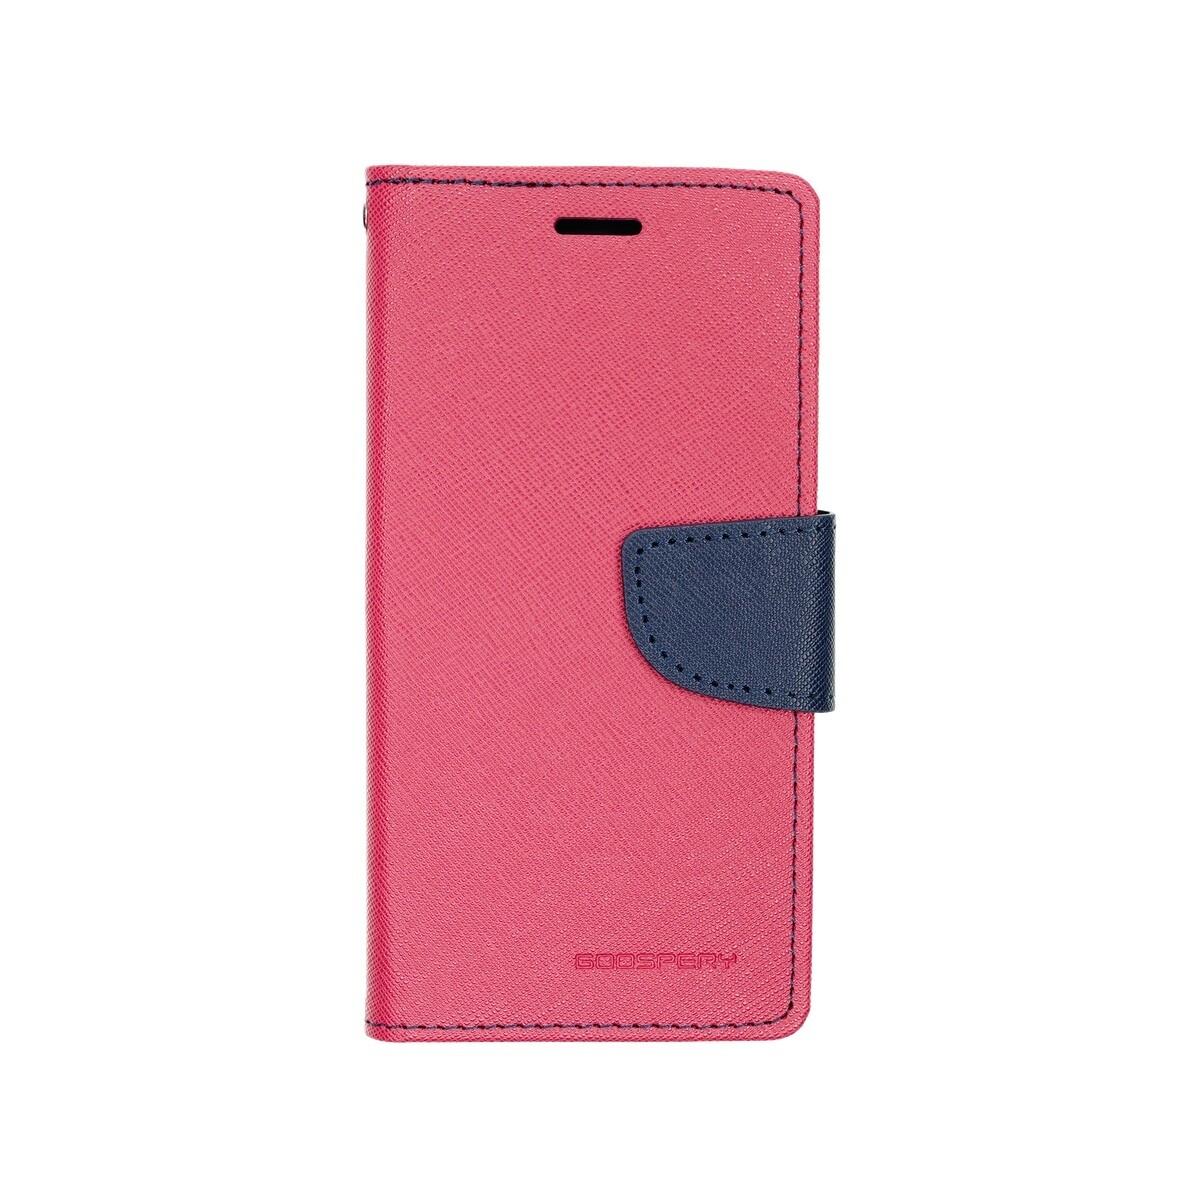 Estuche GOOSPERY Fancy Diary Fucsia/Azul Marino SAMSUNG S8